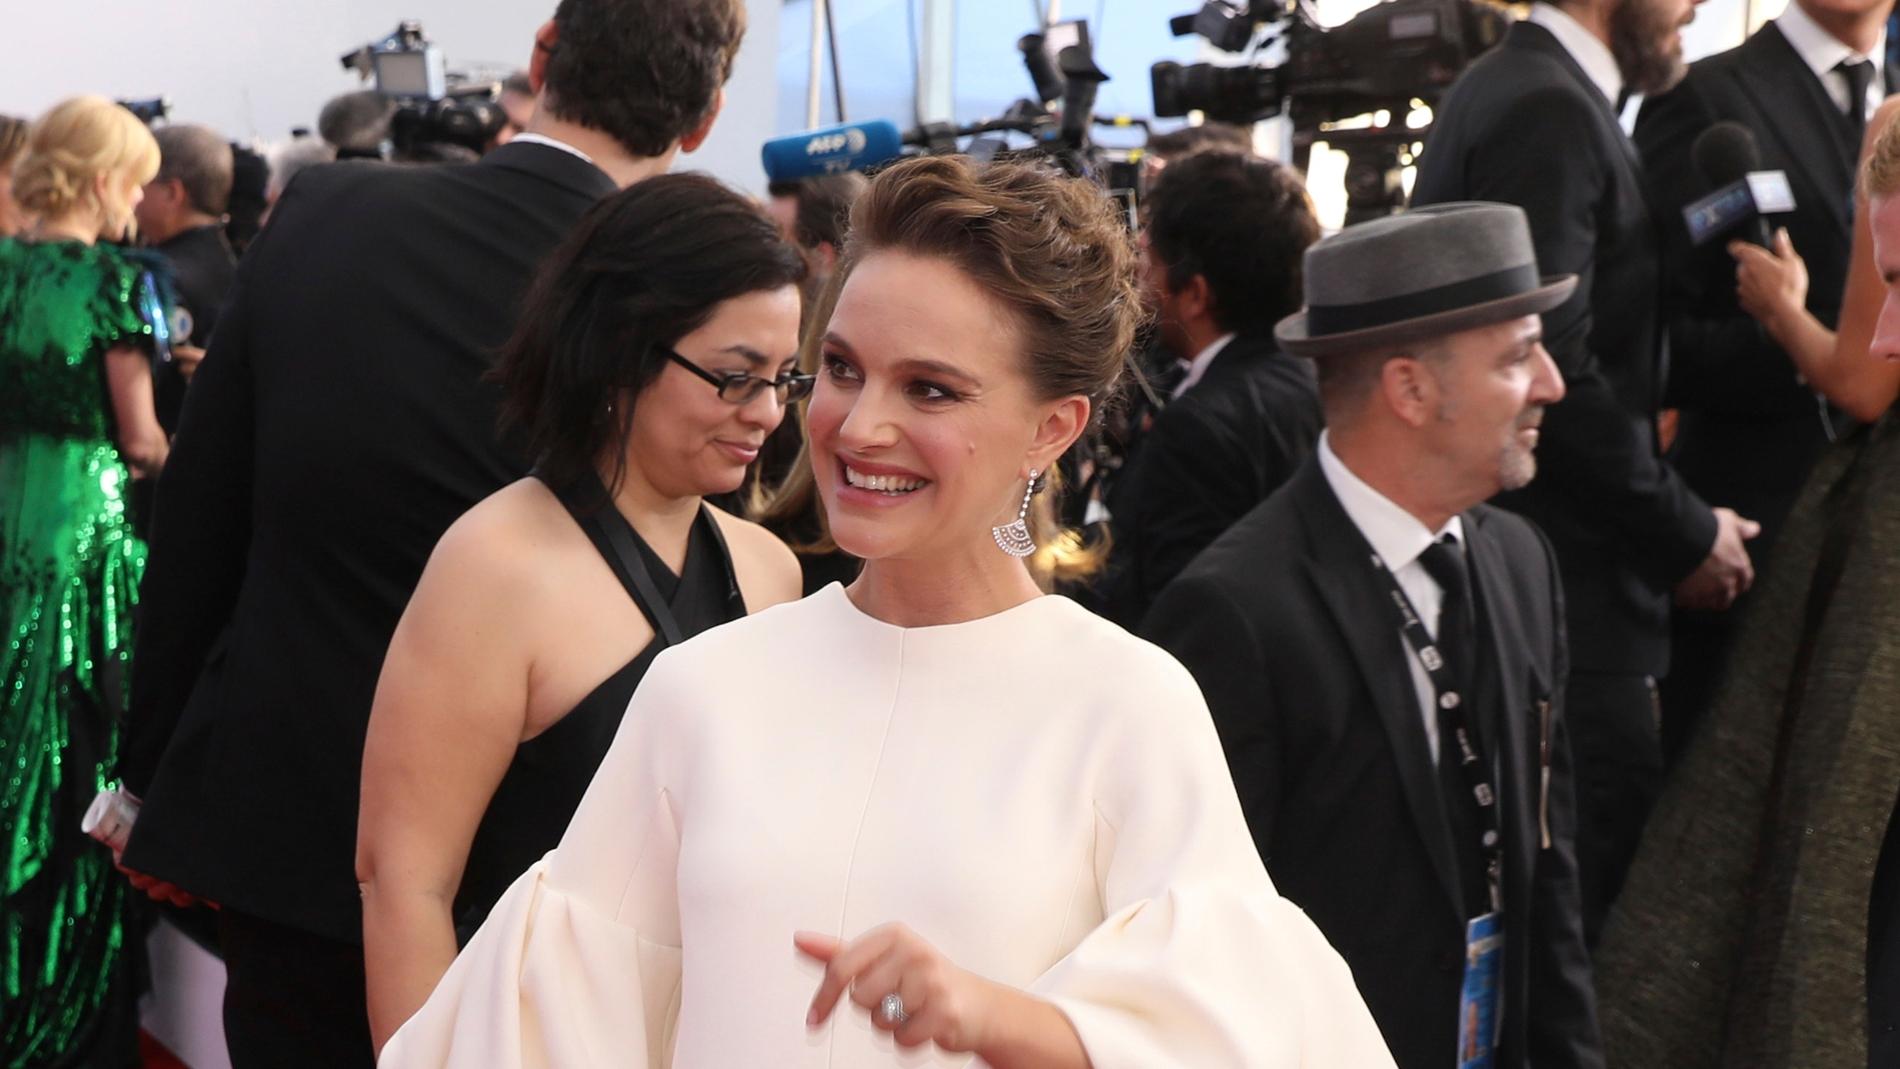 Natalie Portman embarazada de nueve meses